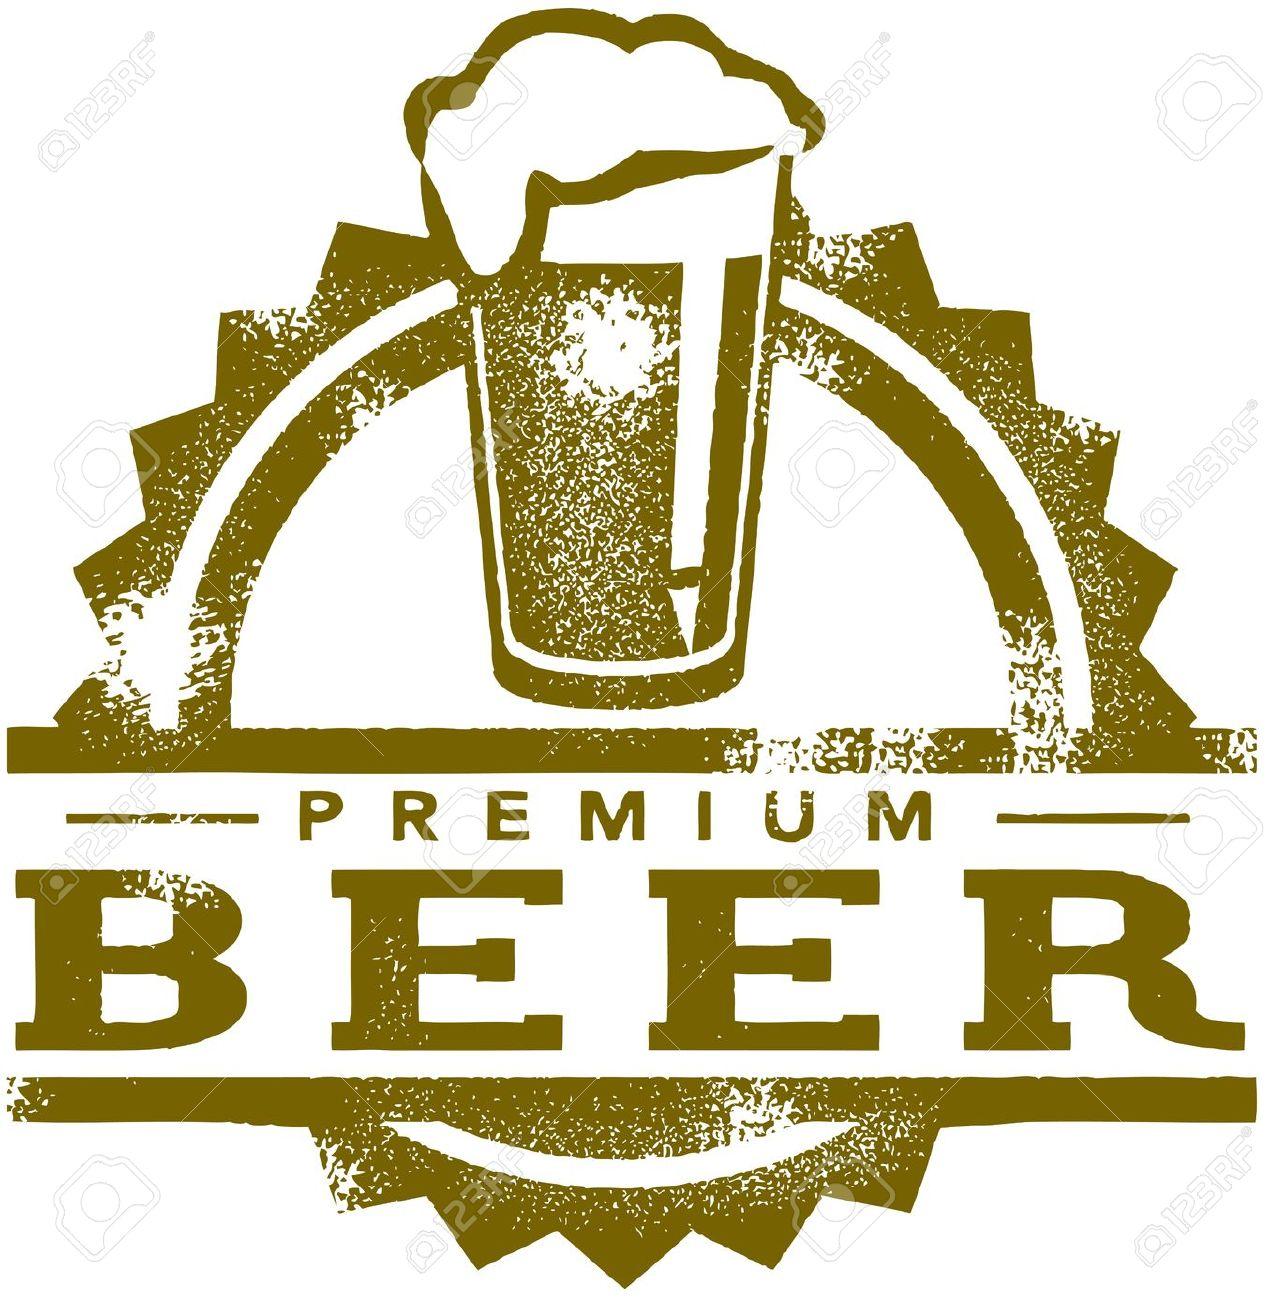 beer-clipart-13846293-Vintage-Premium-Beer-Stamp-Stock-Vector-beer ...